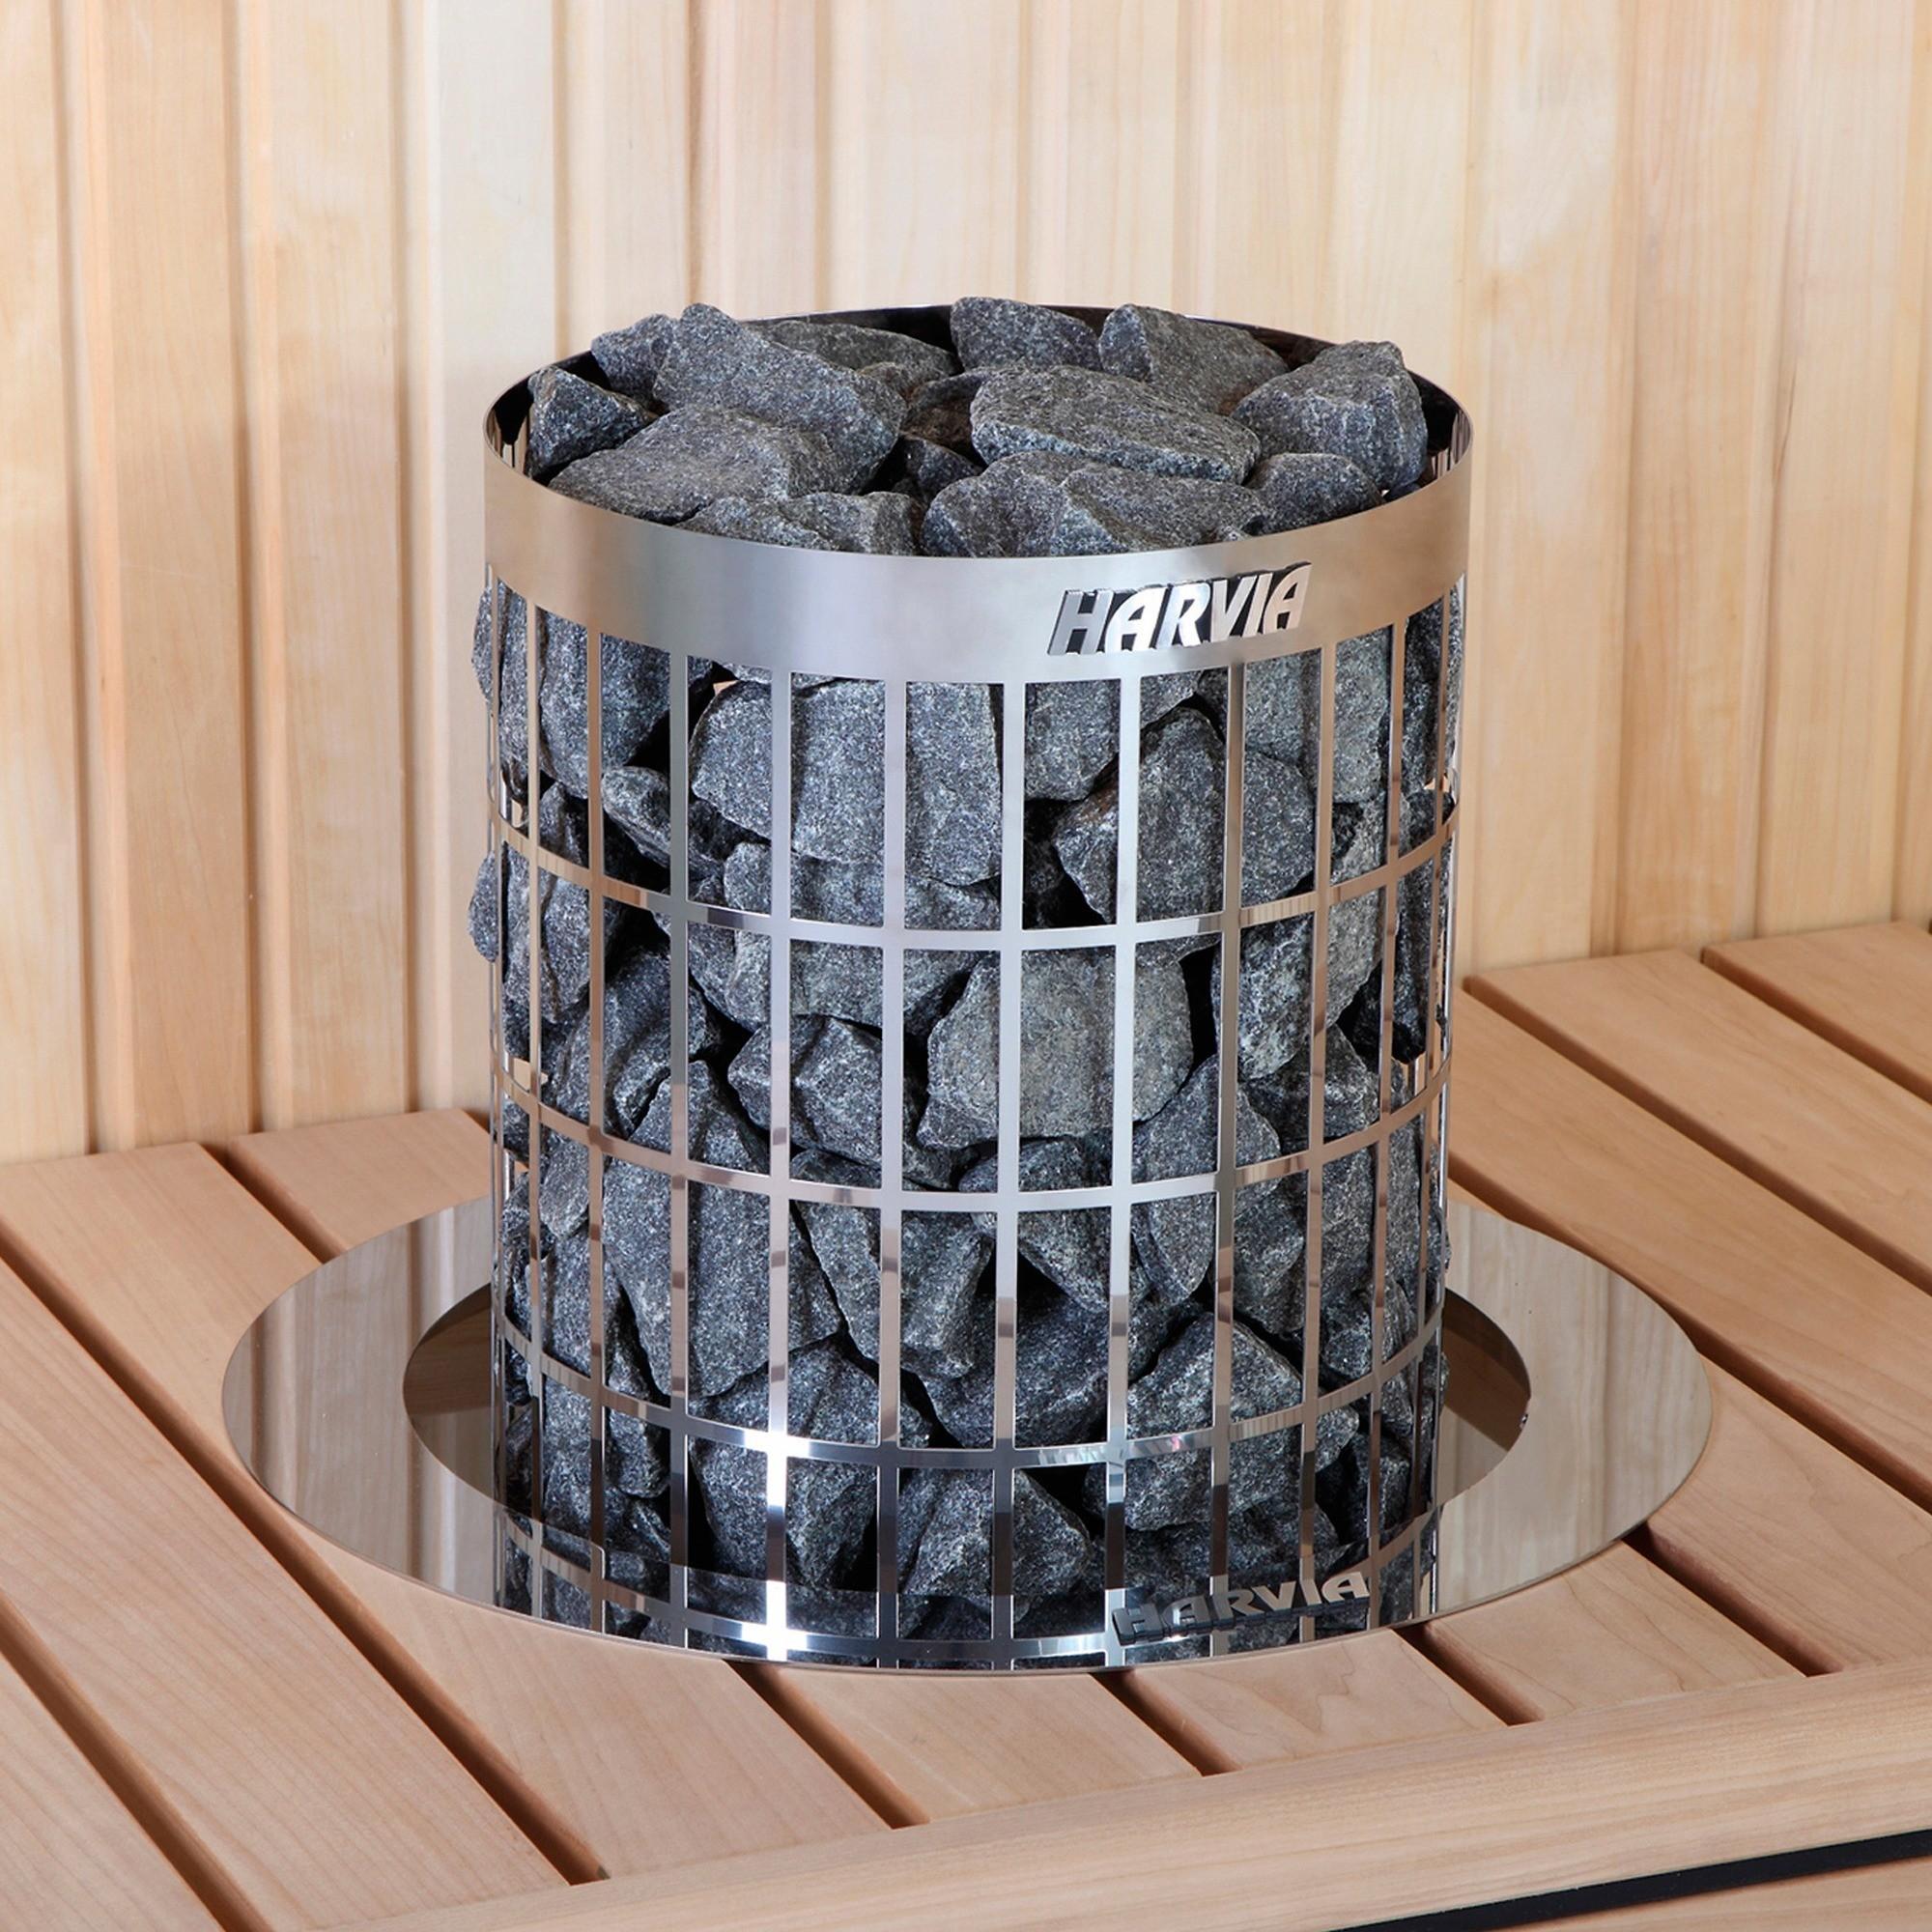 einbaurahmen hpc1 f r harvia cilindro 79 99. Black Bedroom Furniture Sets. Home Design Ideas